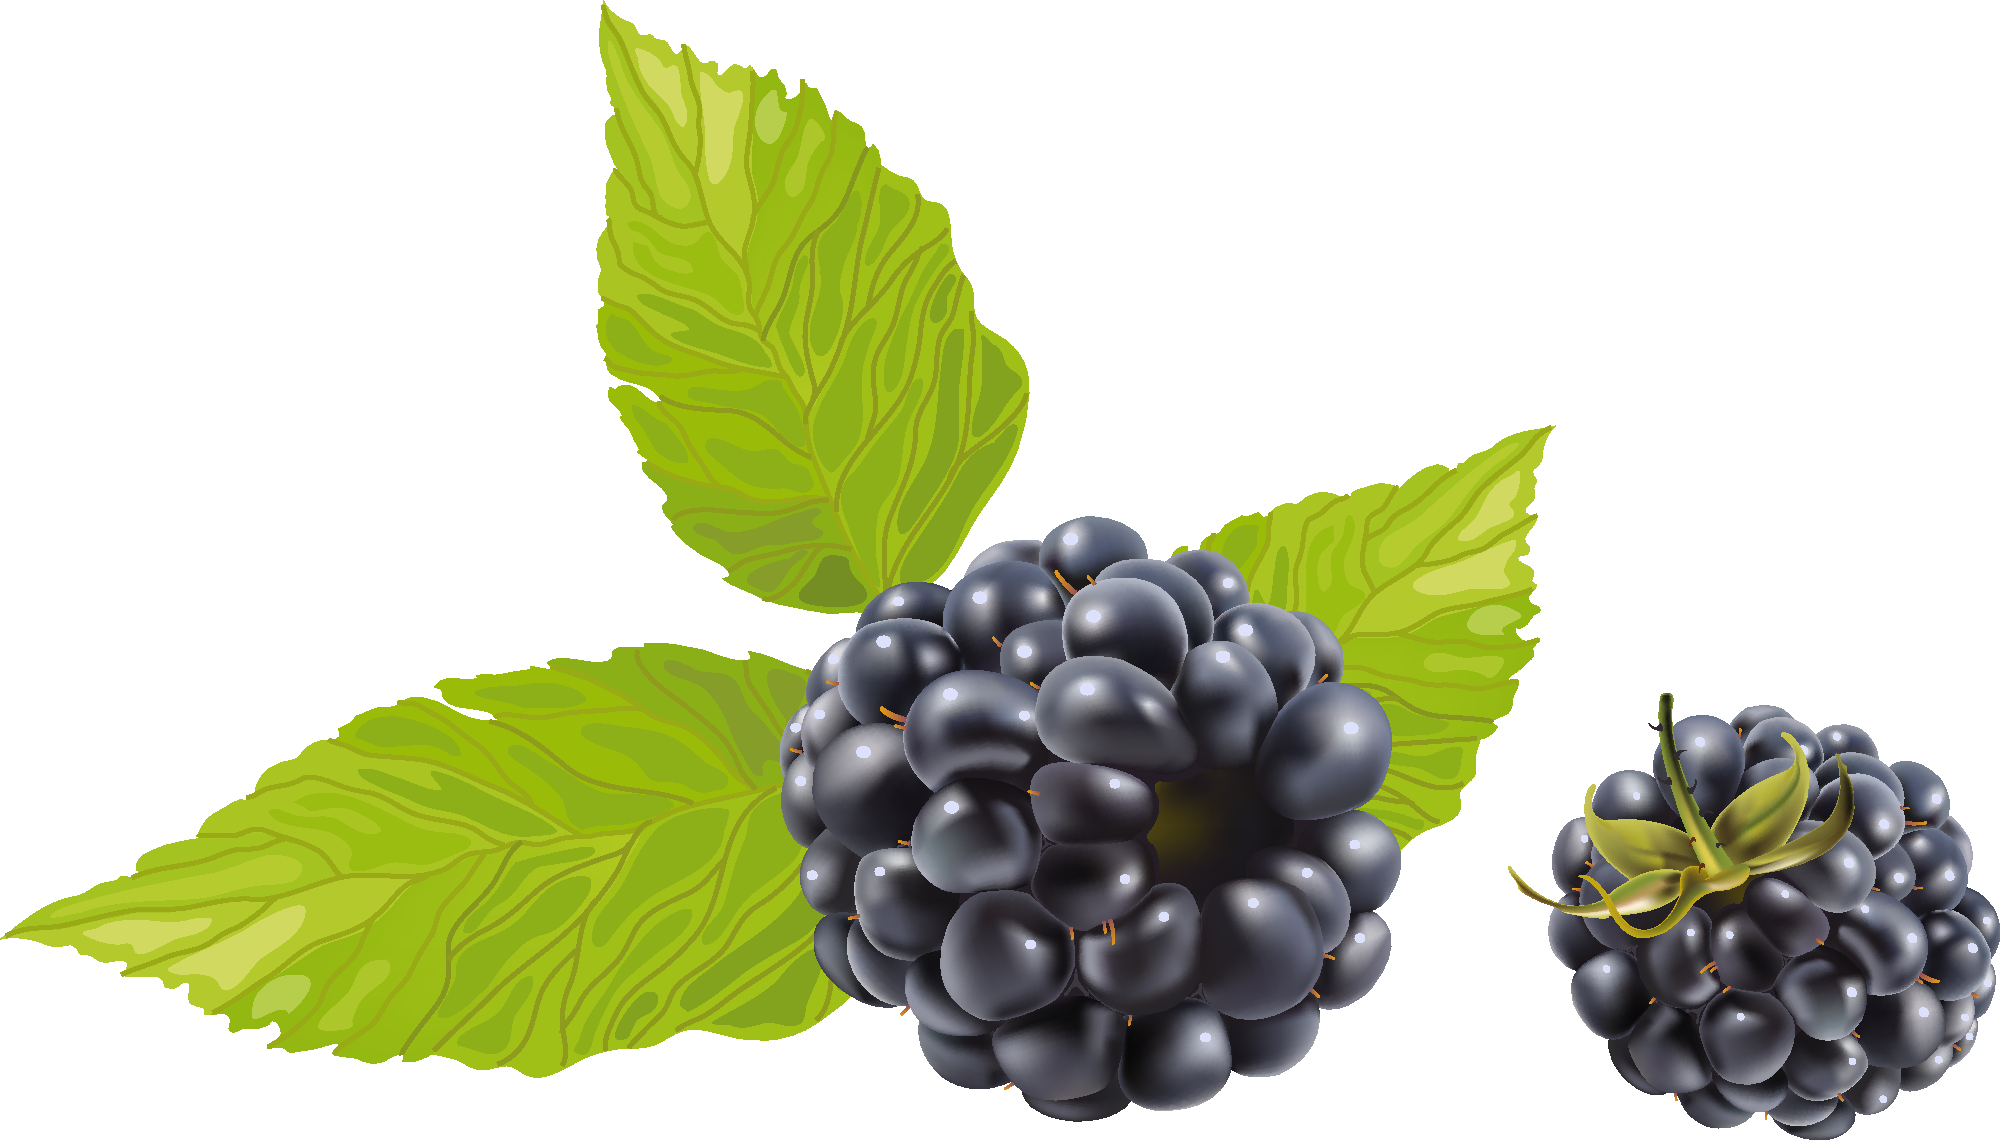 2000x1140 15 Berry Vector Blackberry For Free Download On Mbtskoudsalg